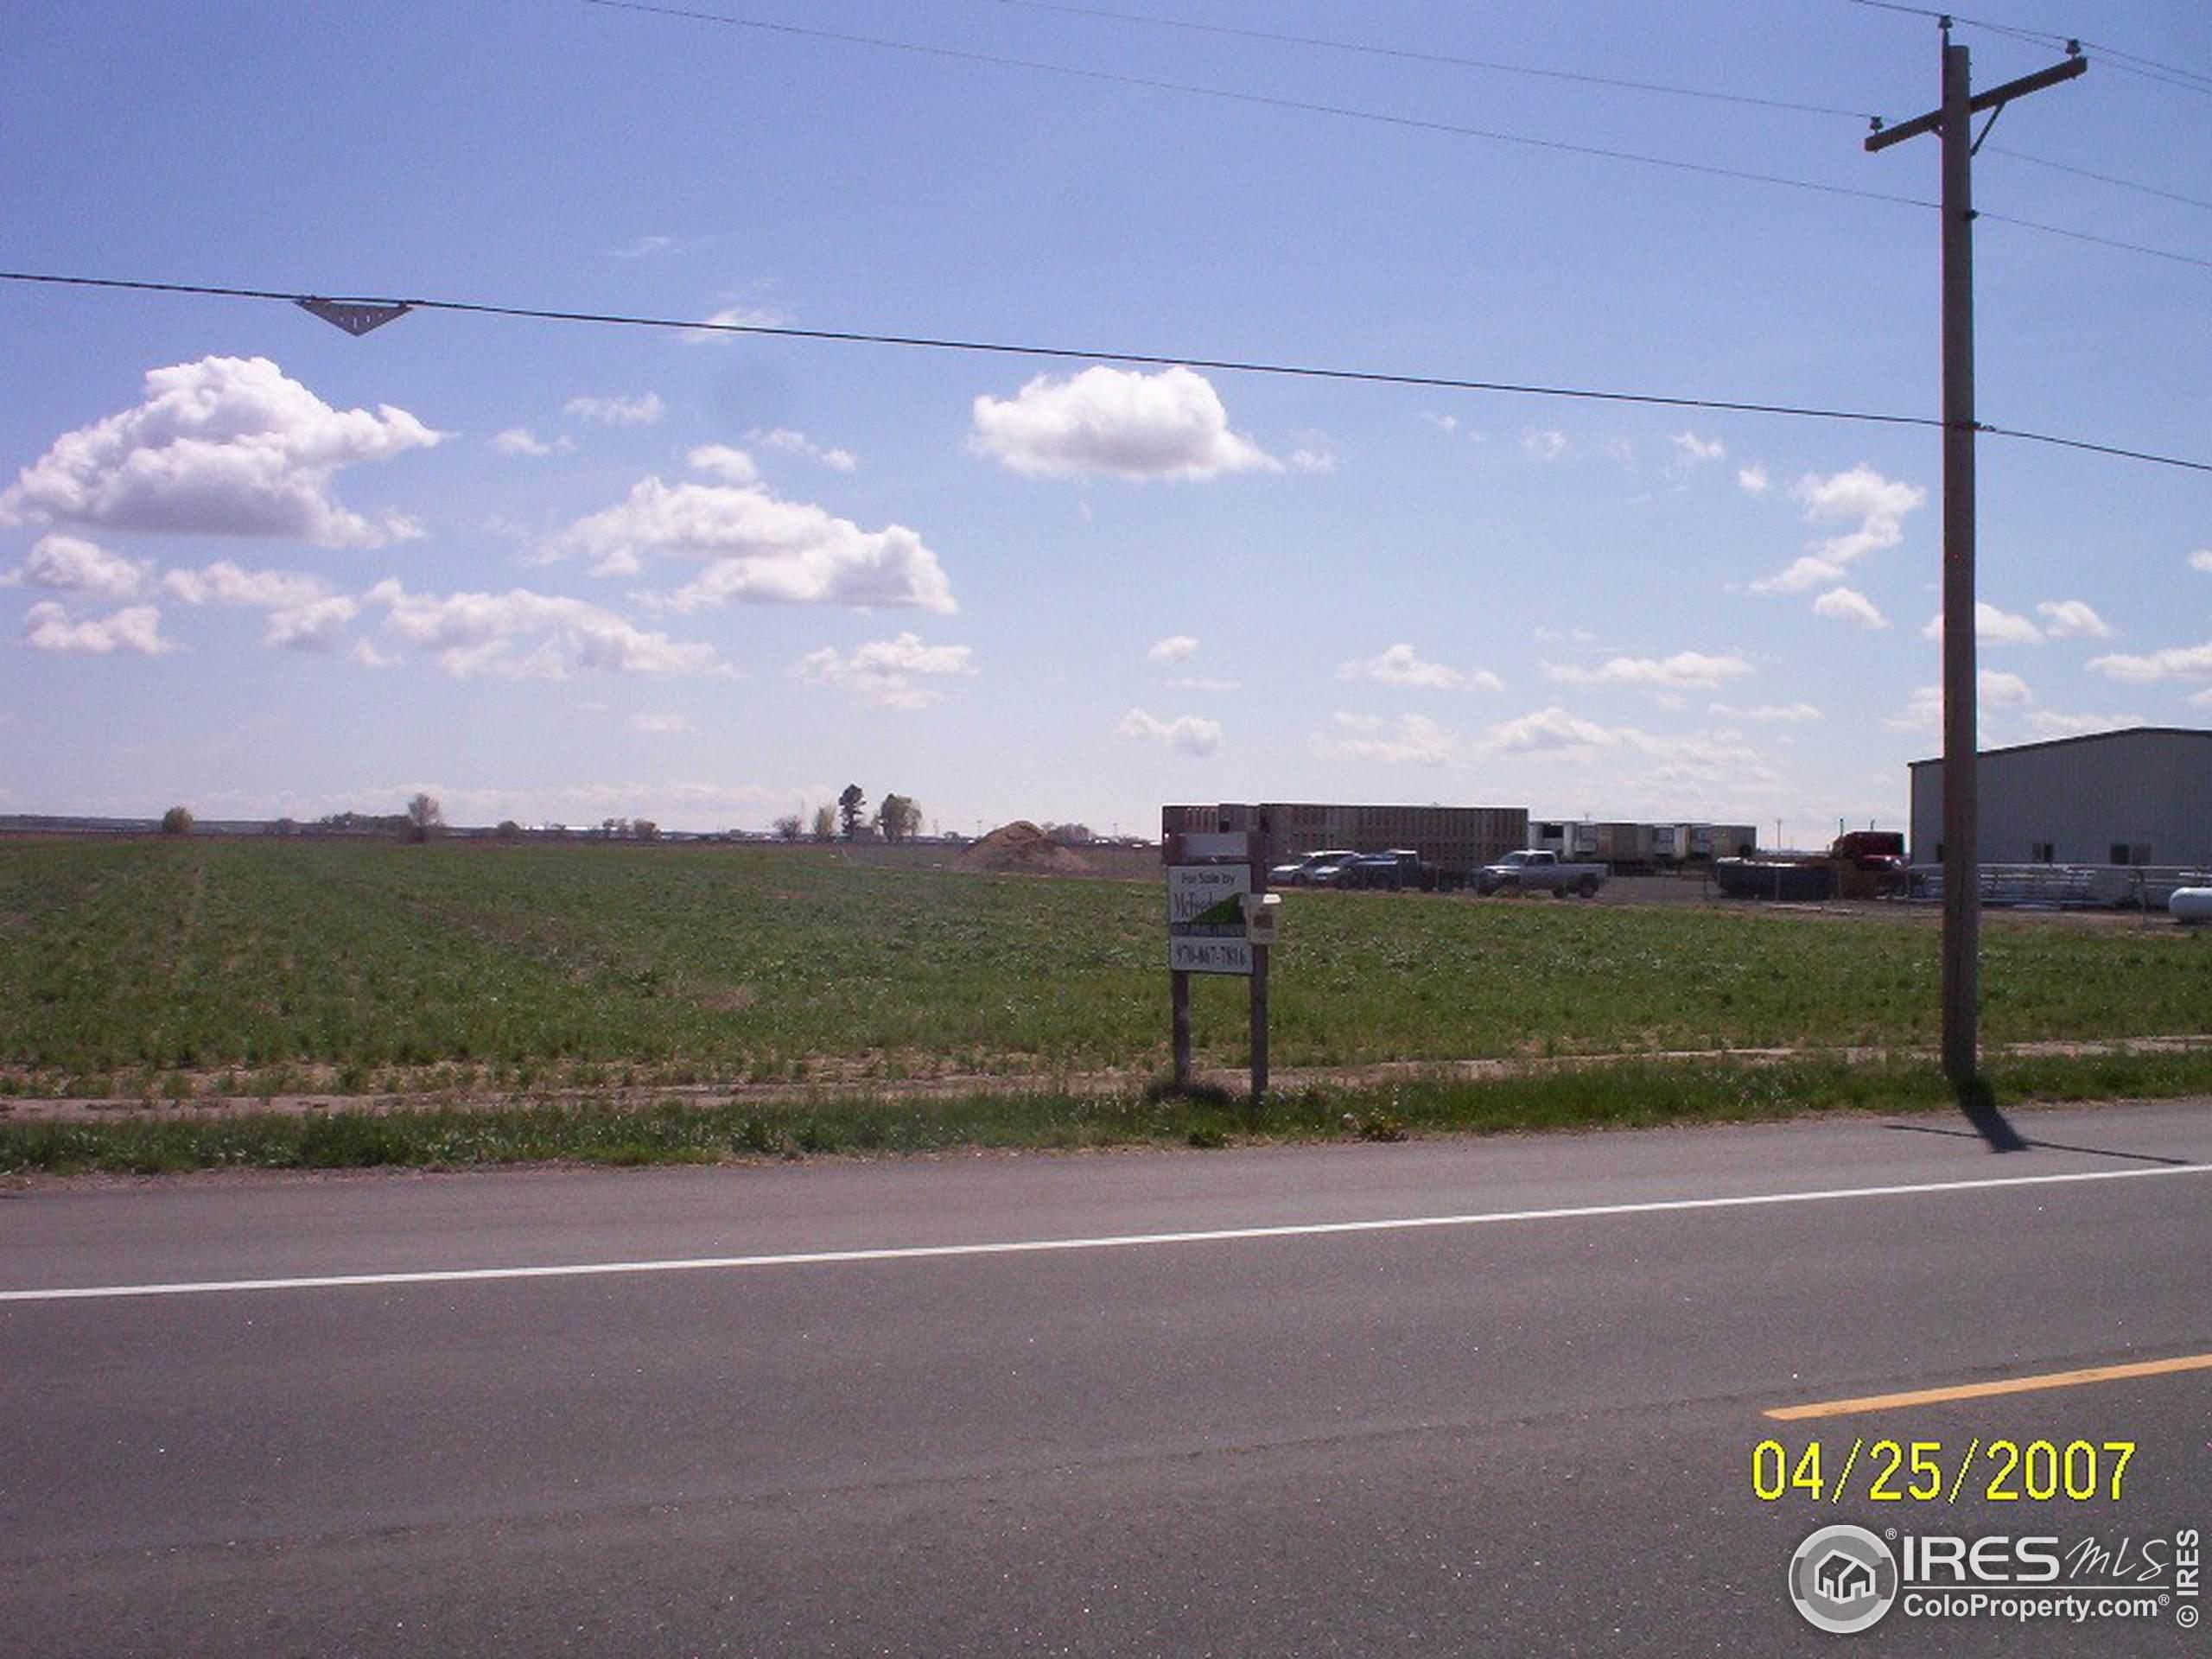 959 W Moorhead Cir D, Boulder, CO 80305 (MLS #907532) :: Jenn Porter Group